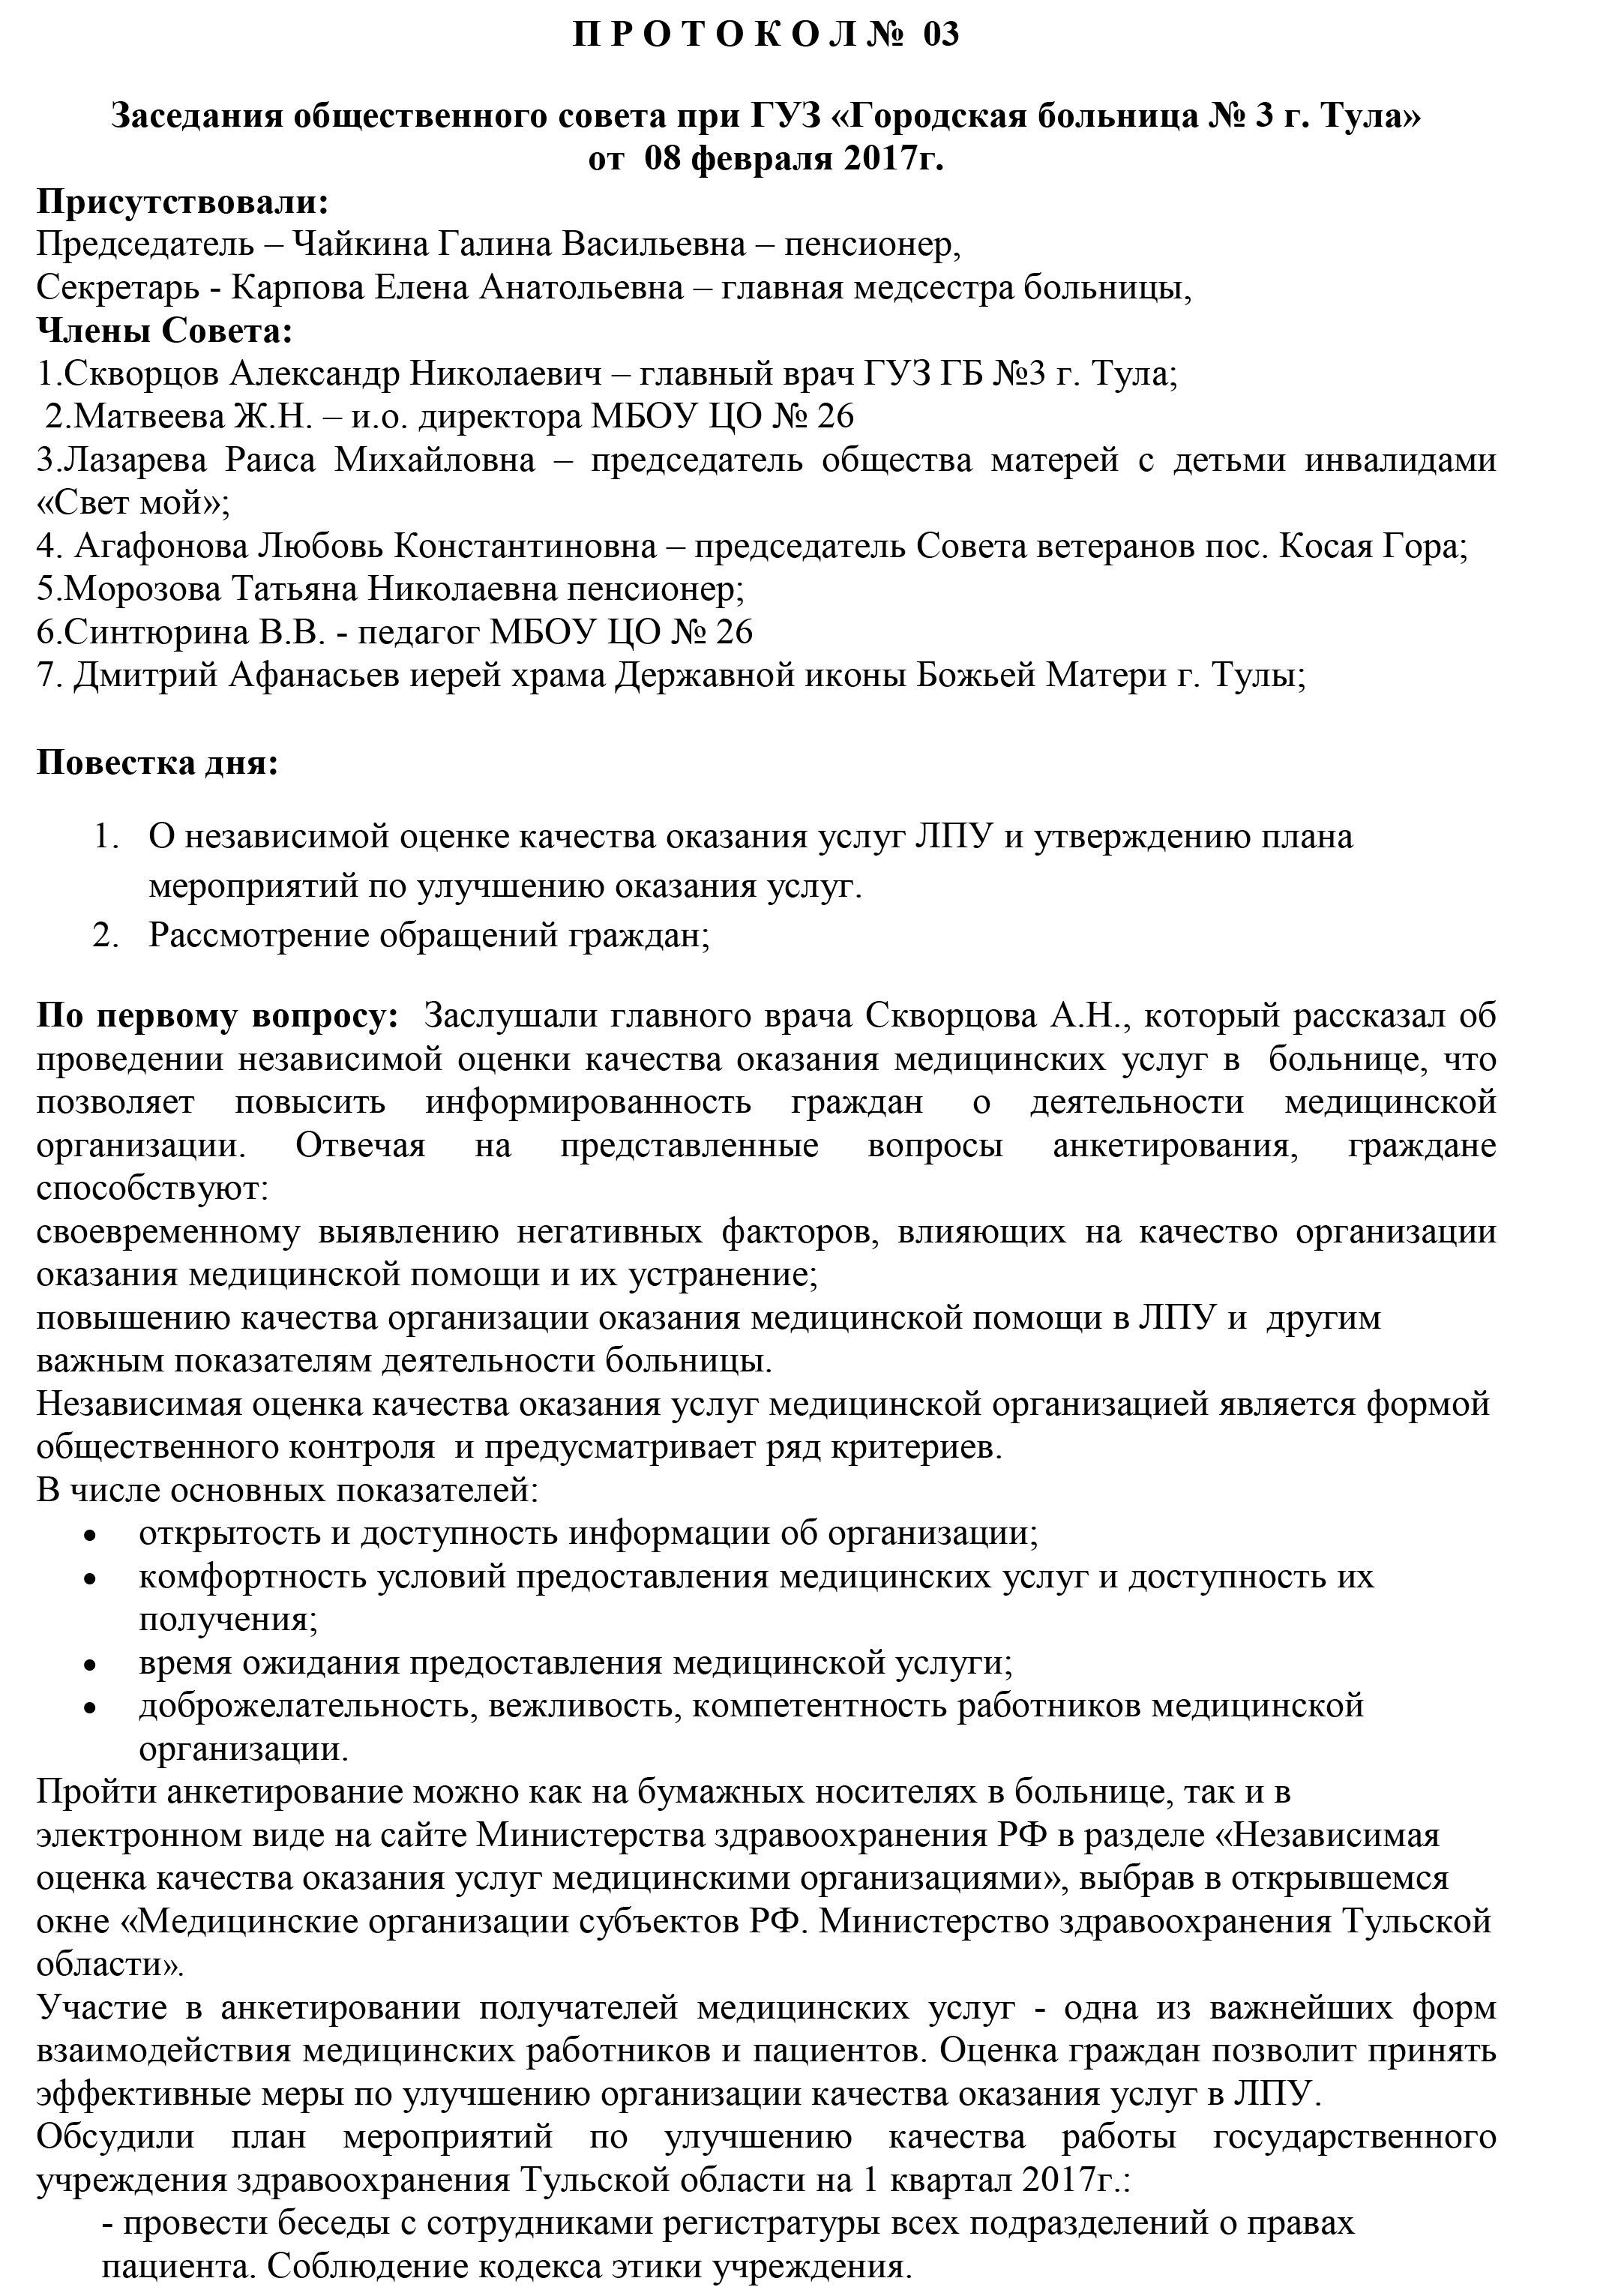 protocol february 1